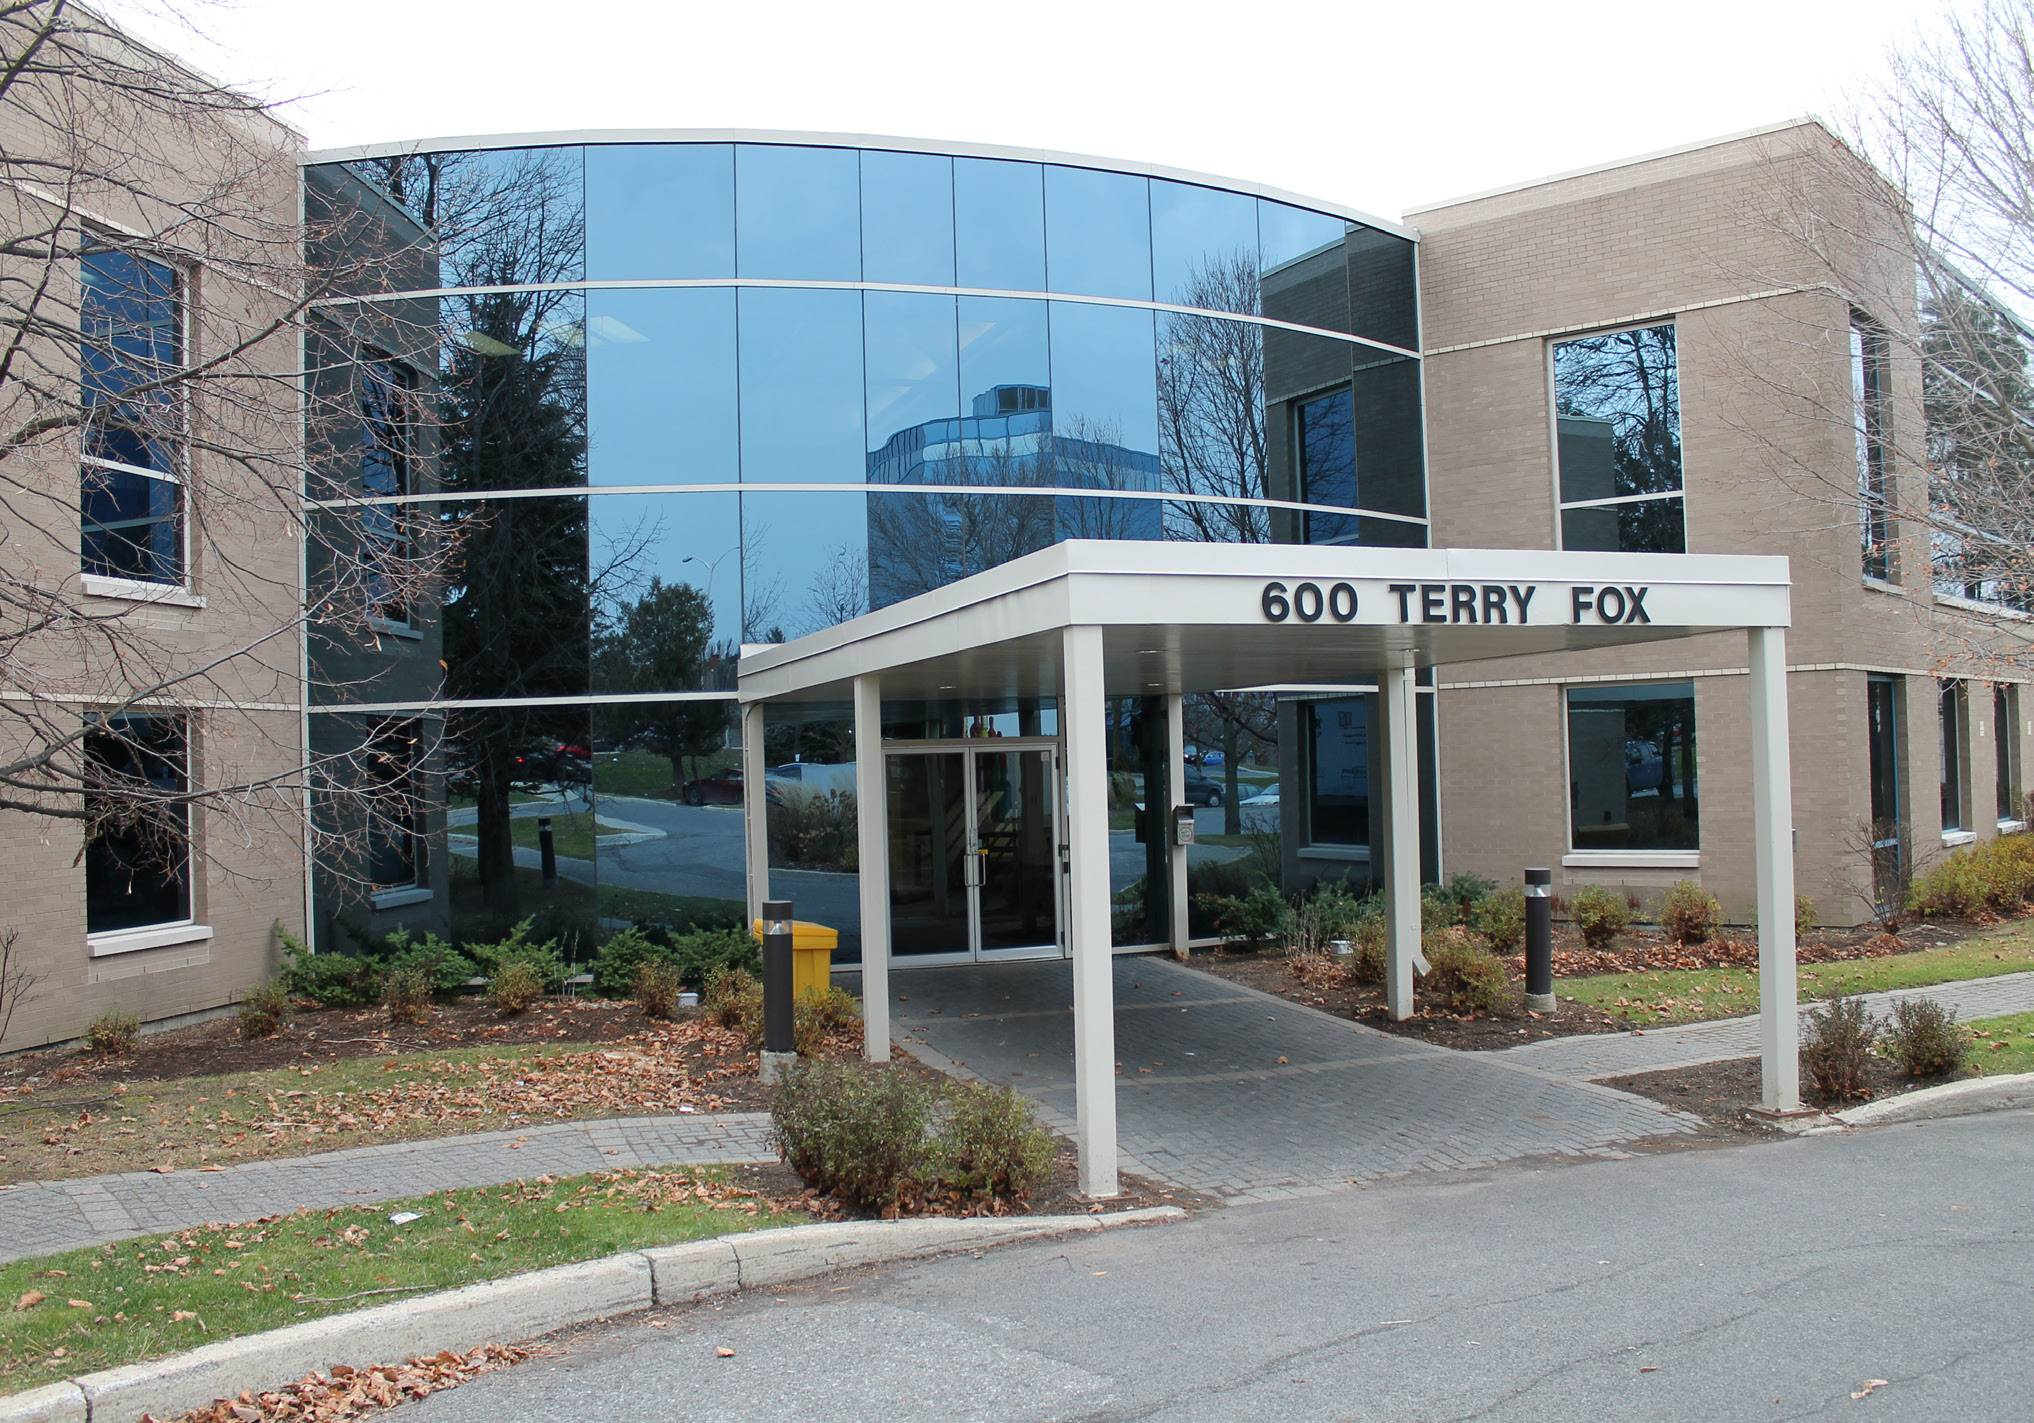 600 Terry Fox Drive, Kanata, Ontario